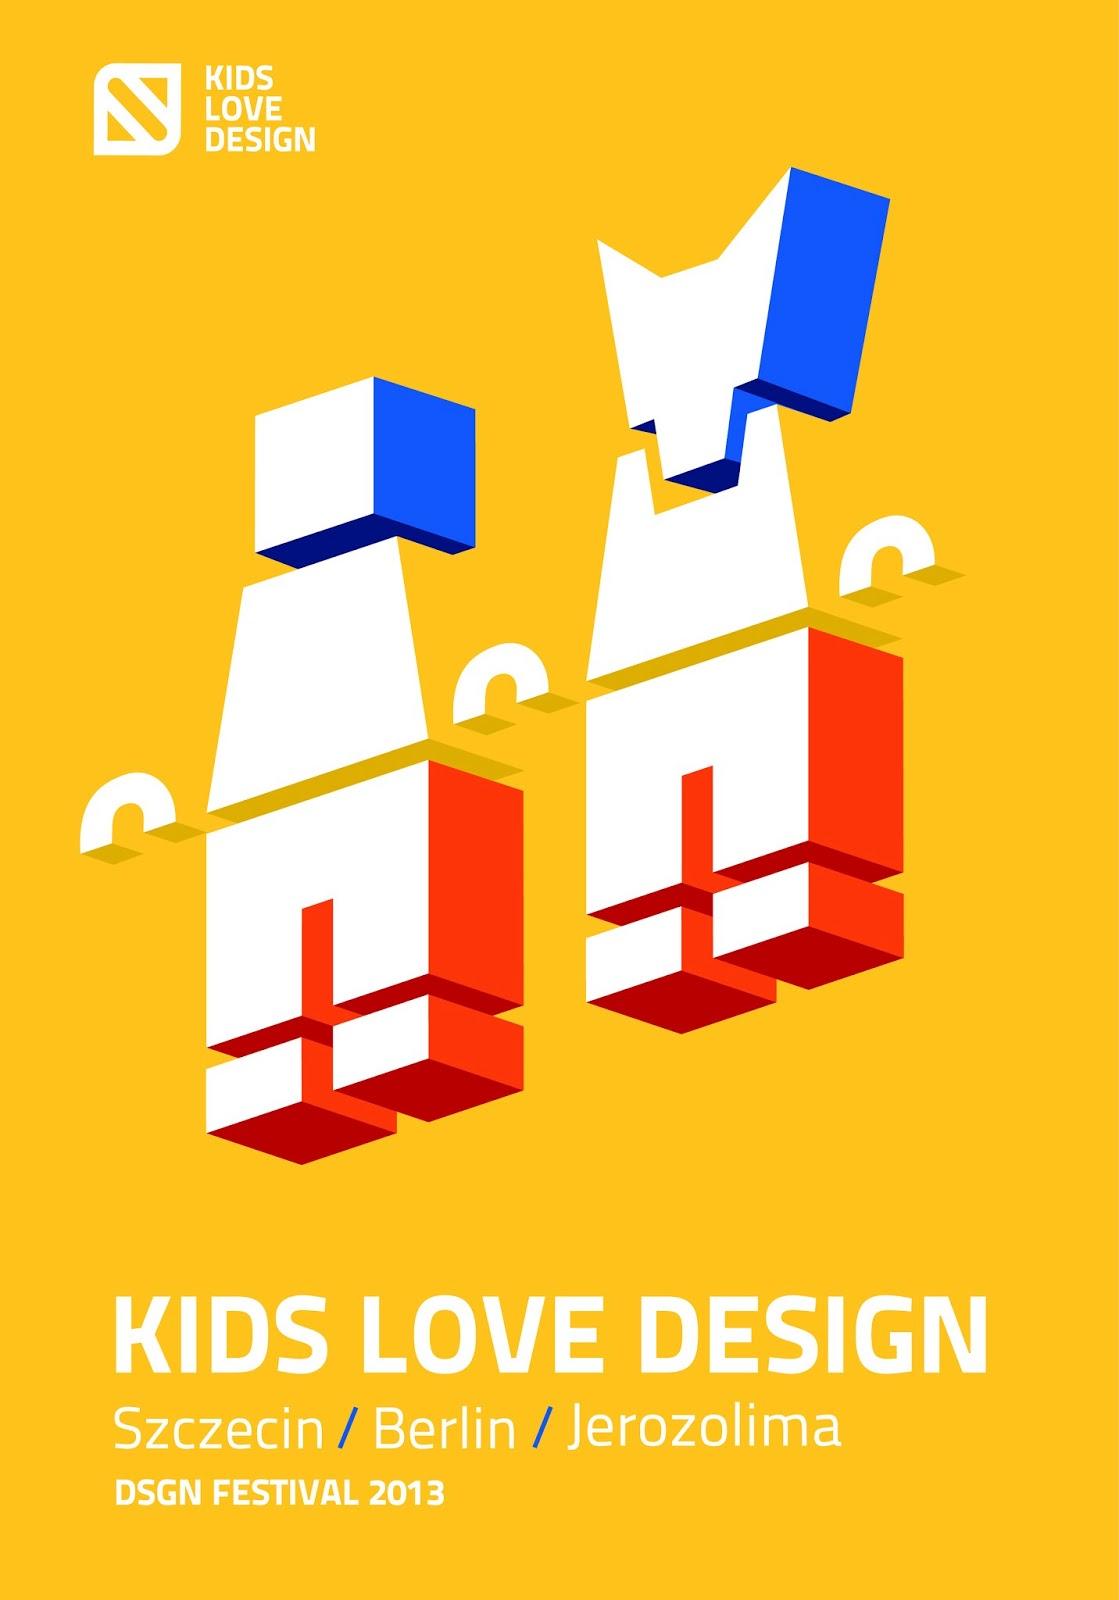 szczecin rowerem z ksi k w r ku kids love design. Black Bedroom Furniture Sets. Home Design Ideas